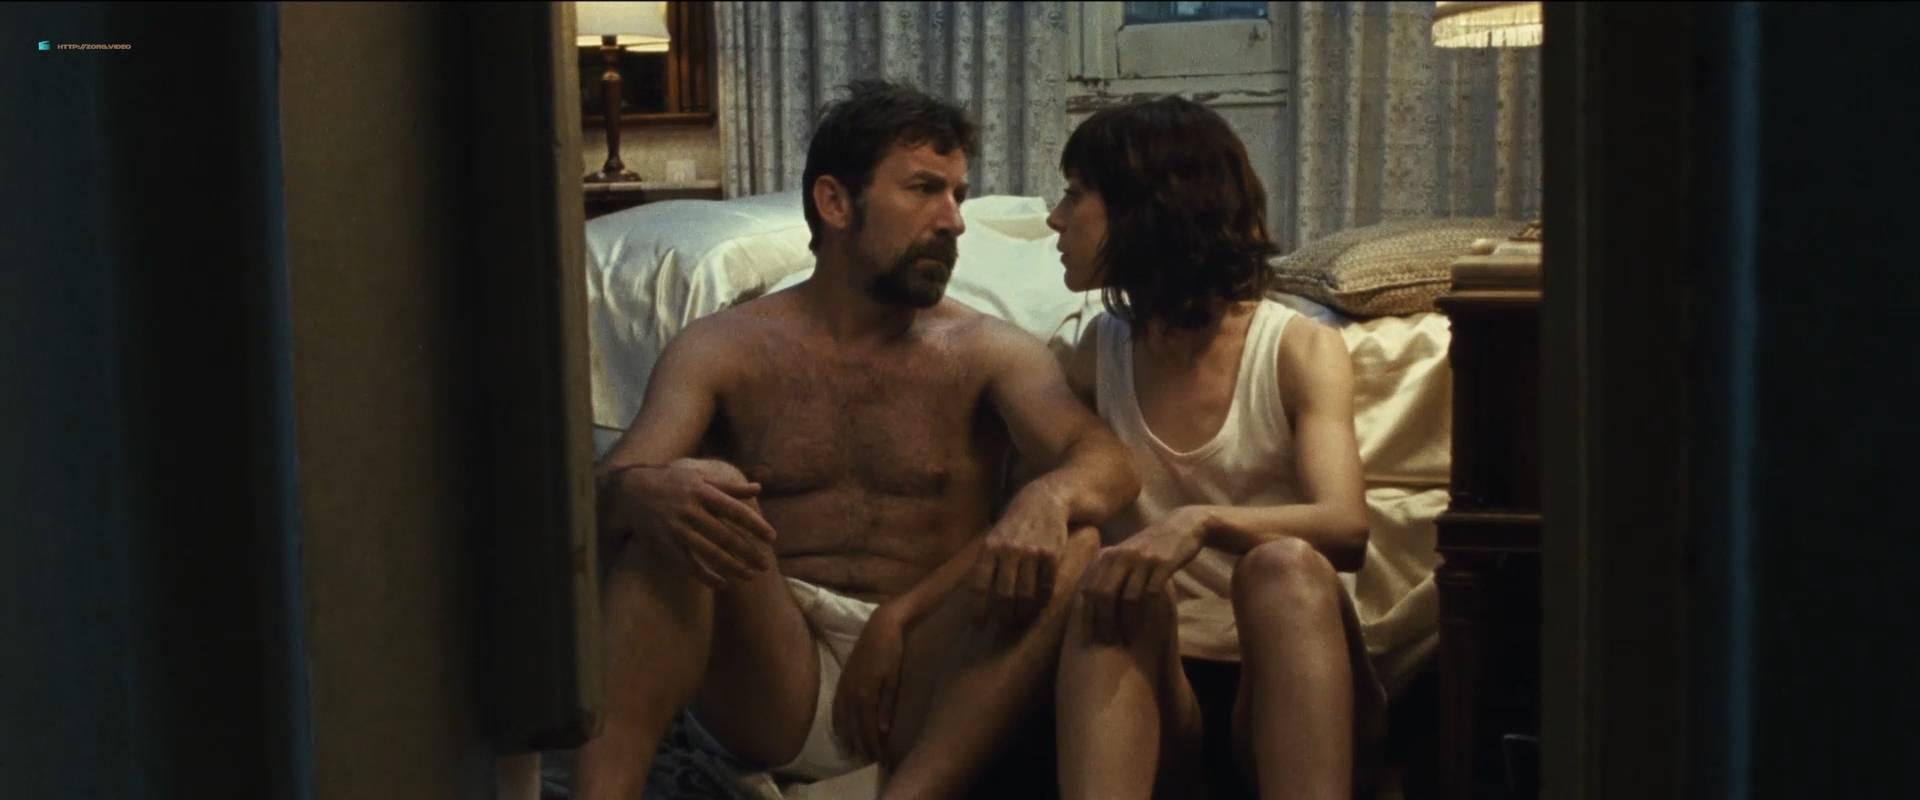 Ruth Díaz nude topless and sex - Tarde Para La Ira (ES -2016) HD 1080p BluRay (7)